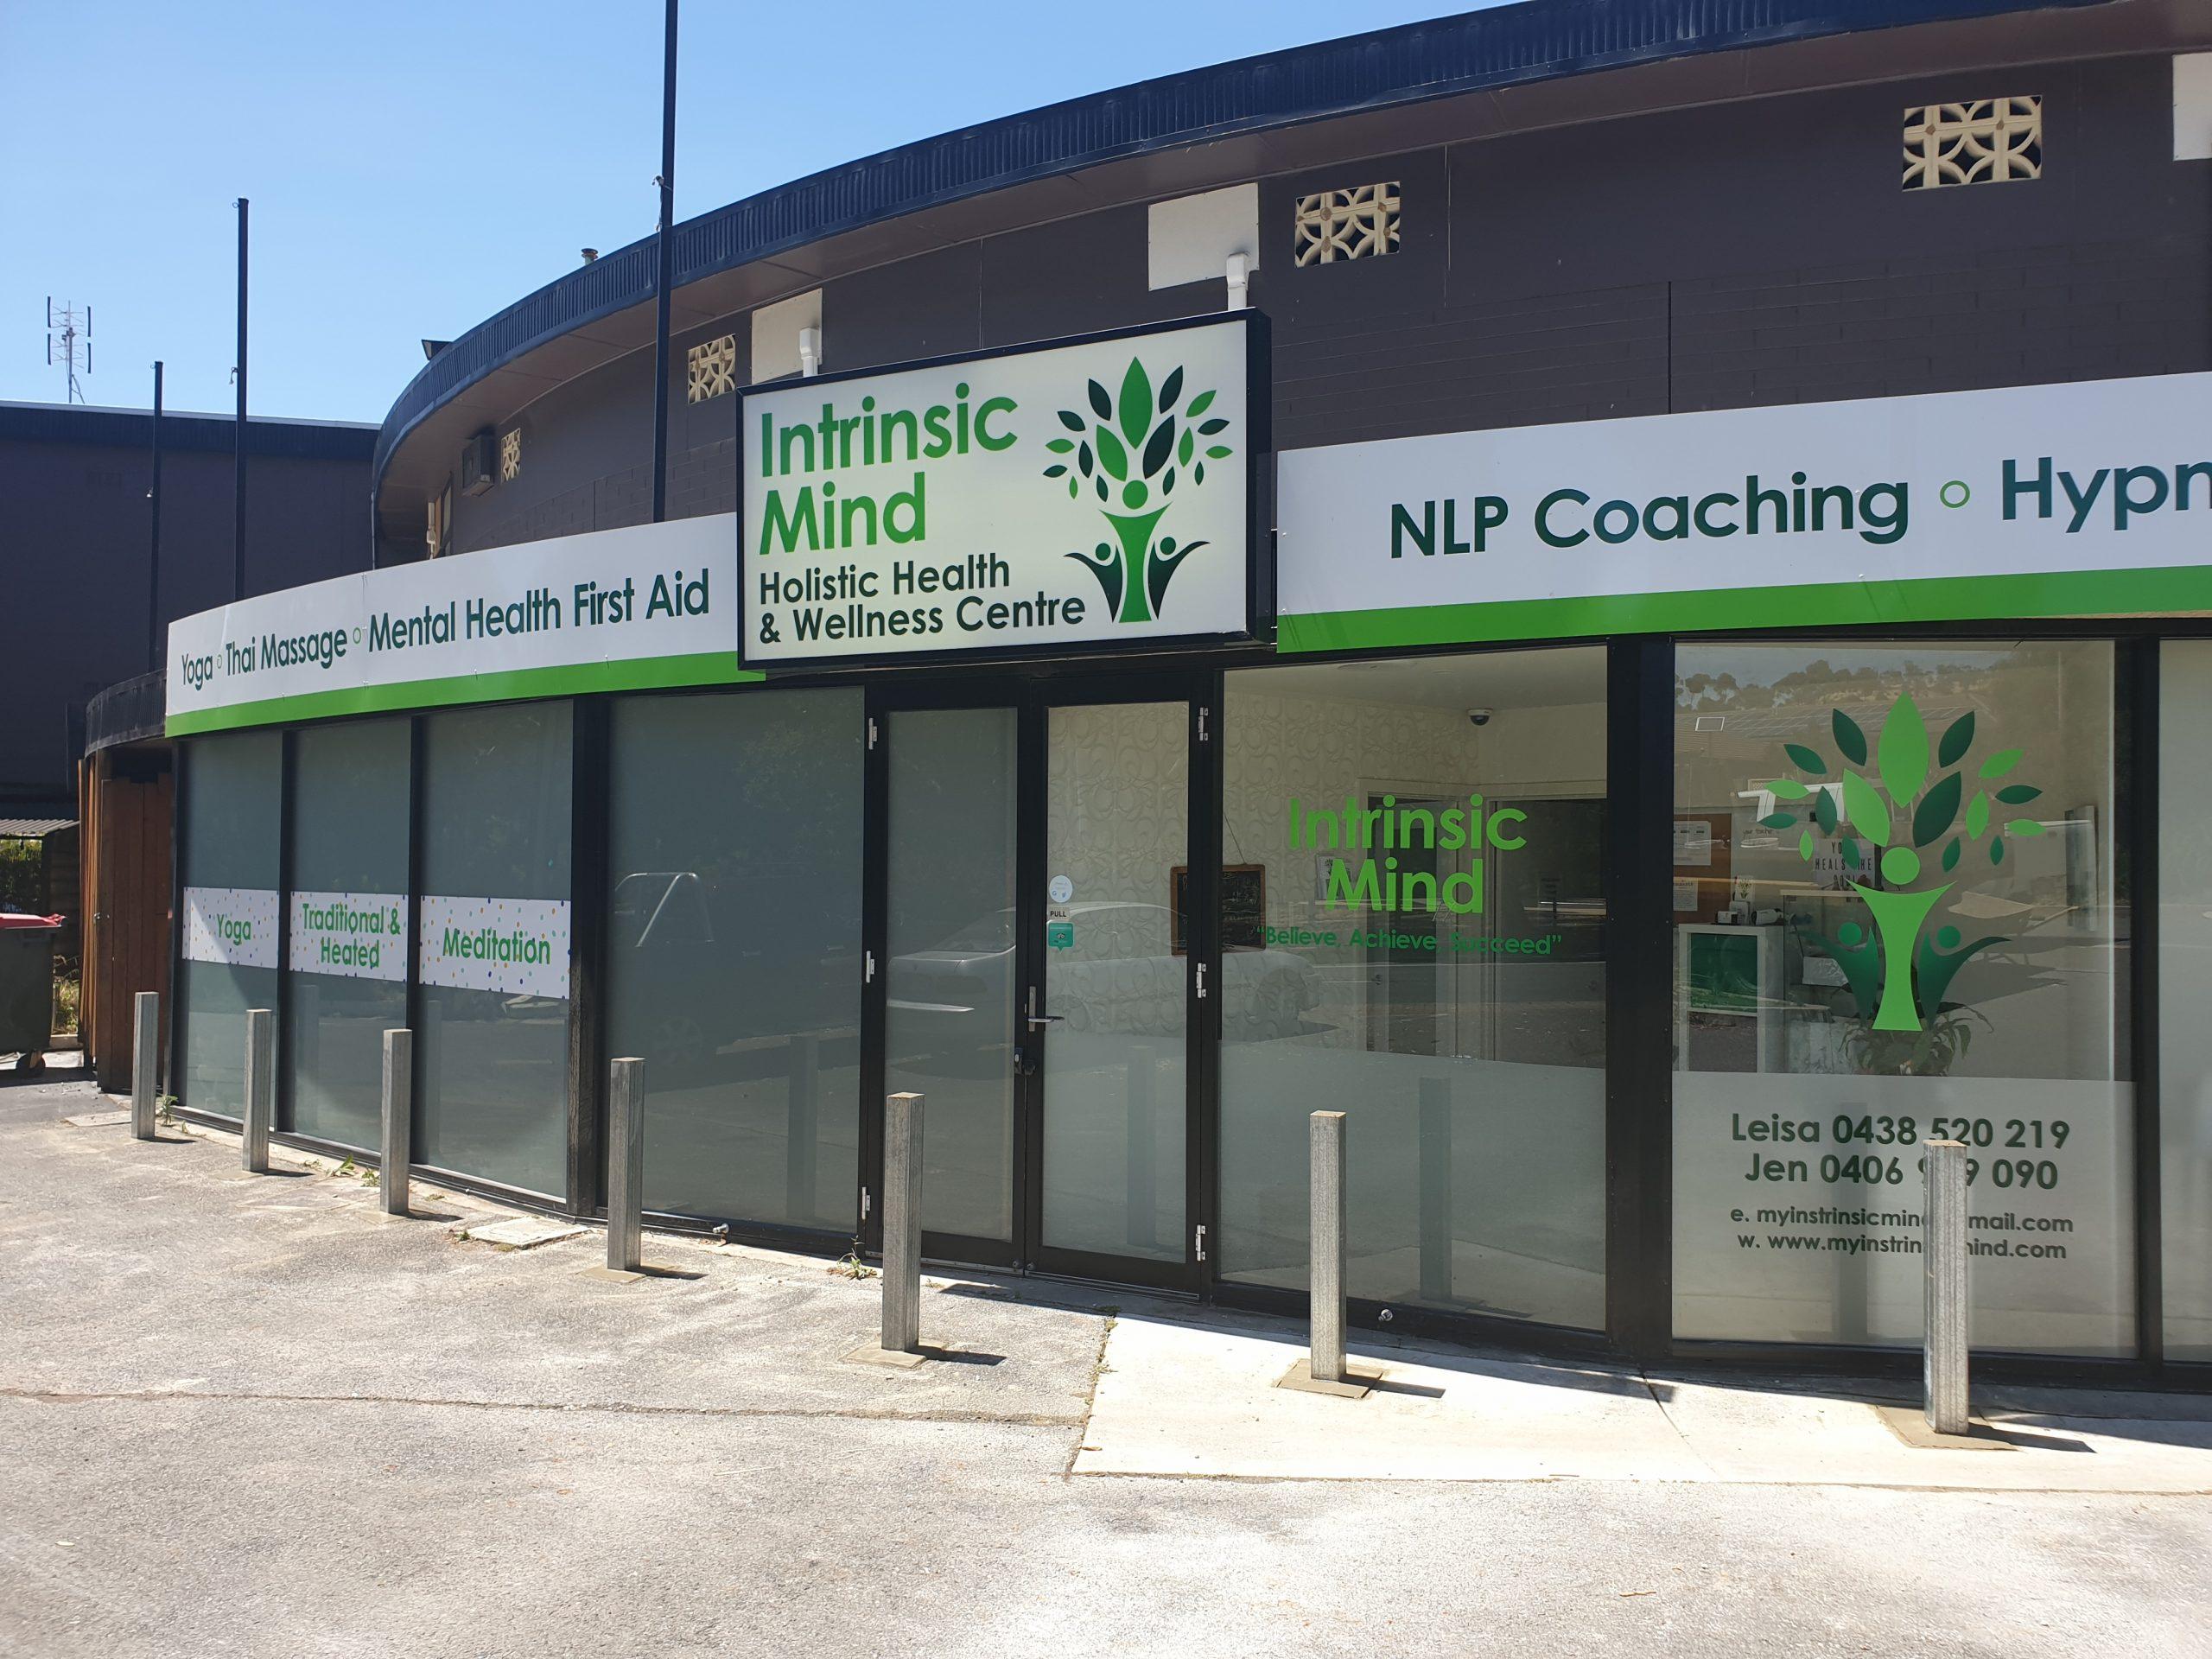 Intrinsic Mind Holistic Health And Wellness Centre